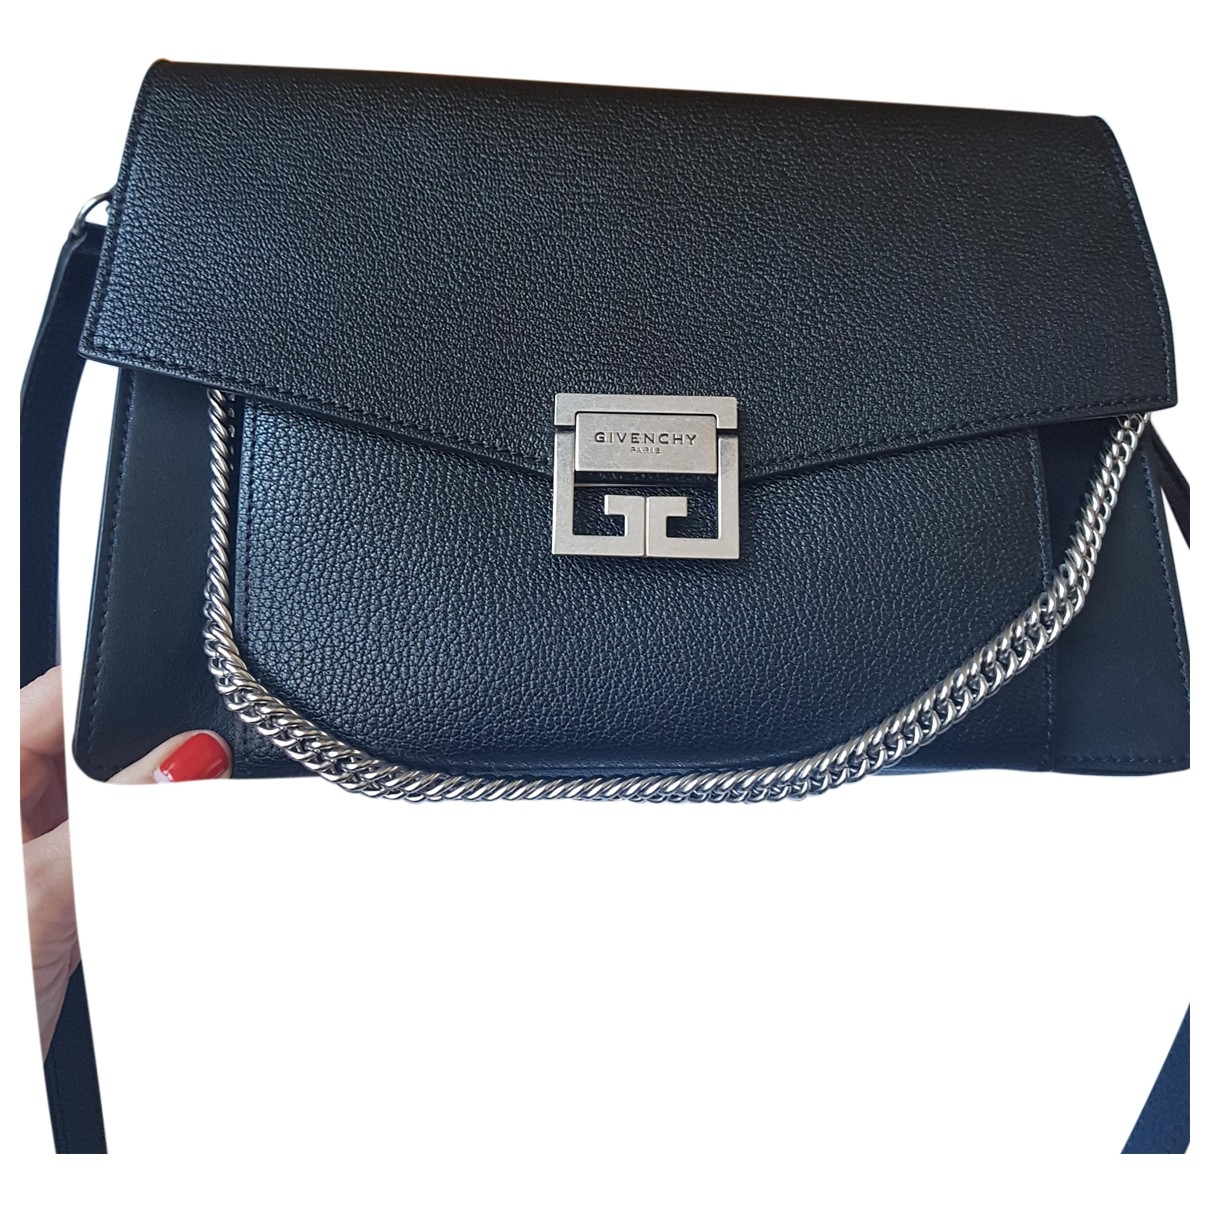 Givenchy GV3 Handtasche in  Schwarz Leder